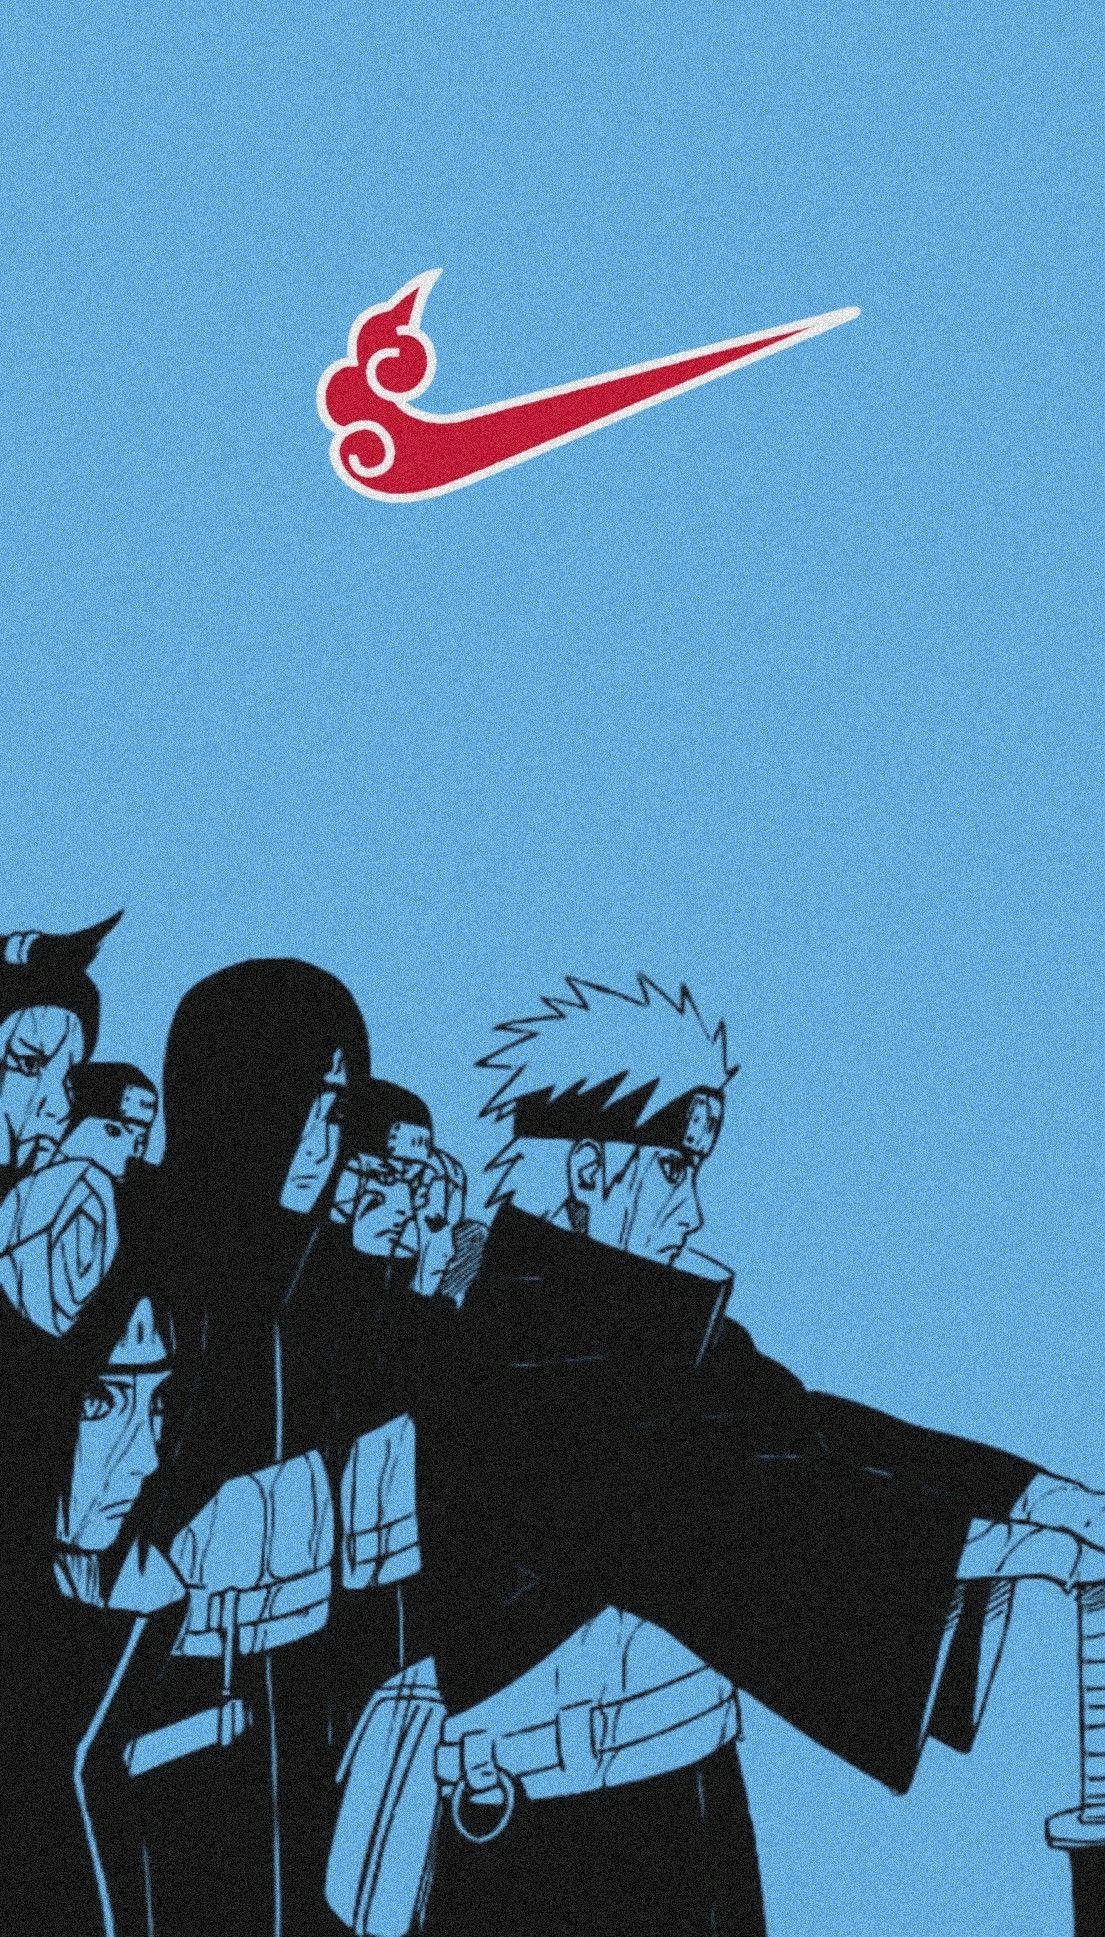 Nike Akatsuki Wallpaper Hd Instagram Vargz7 Naruto Wallpaper Iphone Cute Anime Wallpaper Cool Anime Wallpapers